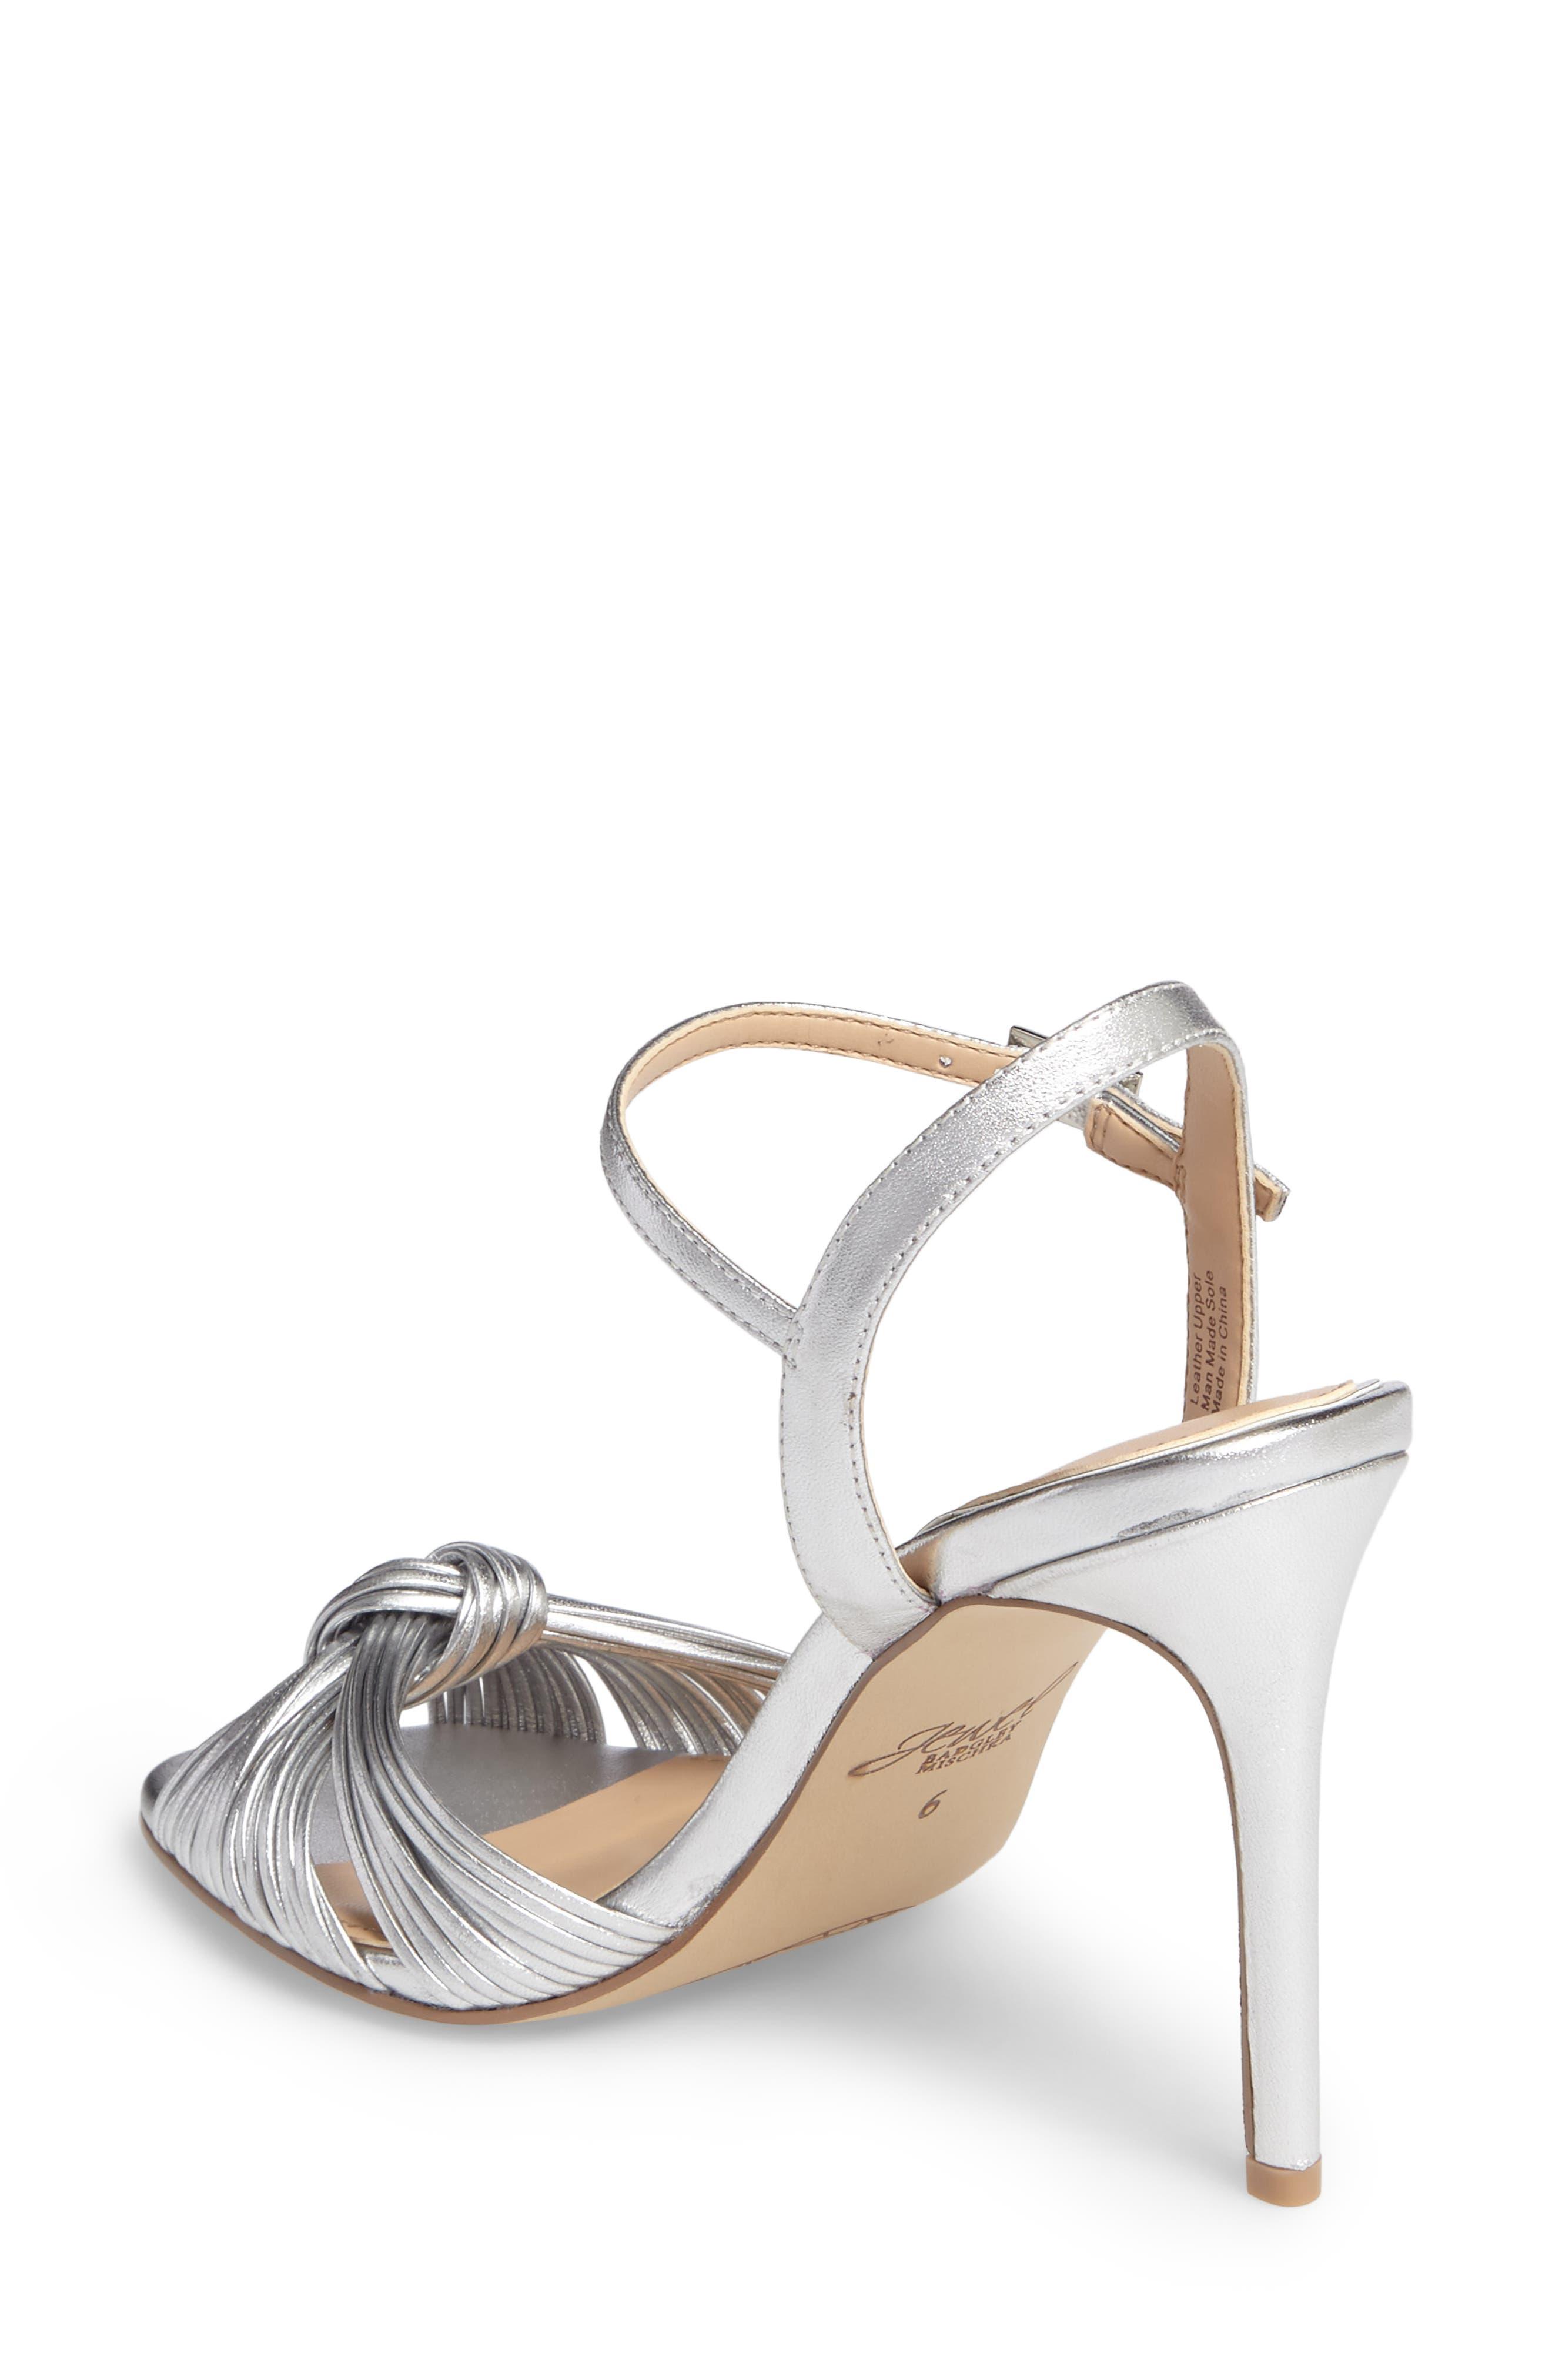 Lady Ankle Strap Sandal,                             Alternate thumbnail 2, color,                             046